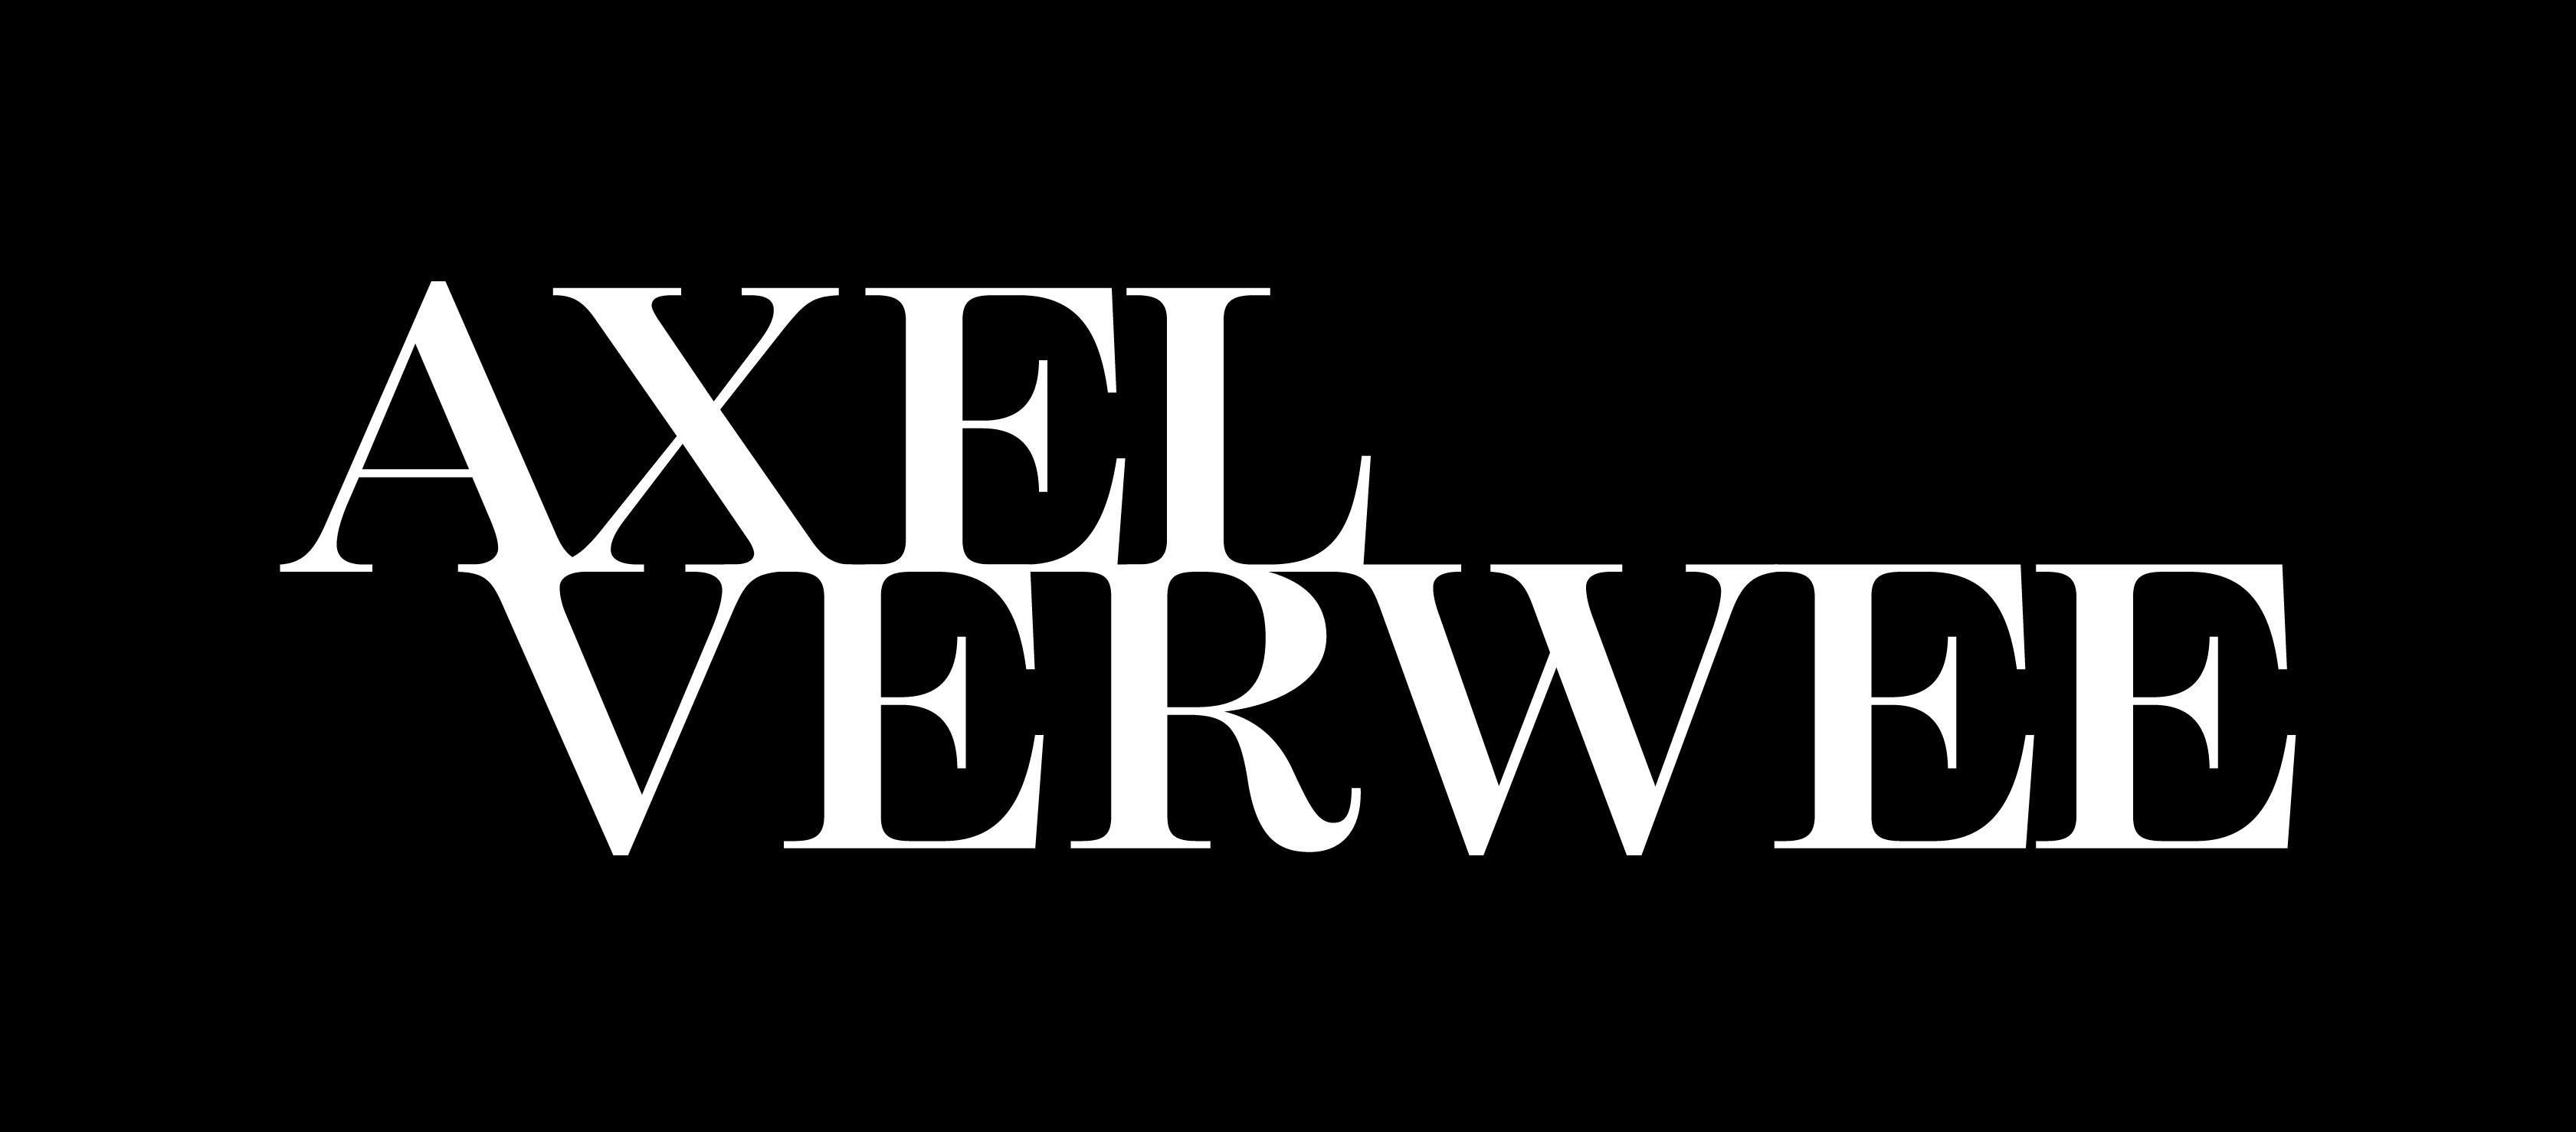 Axel Verwee